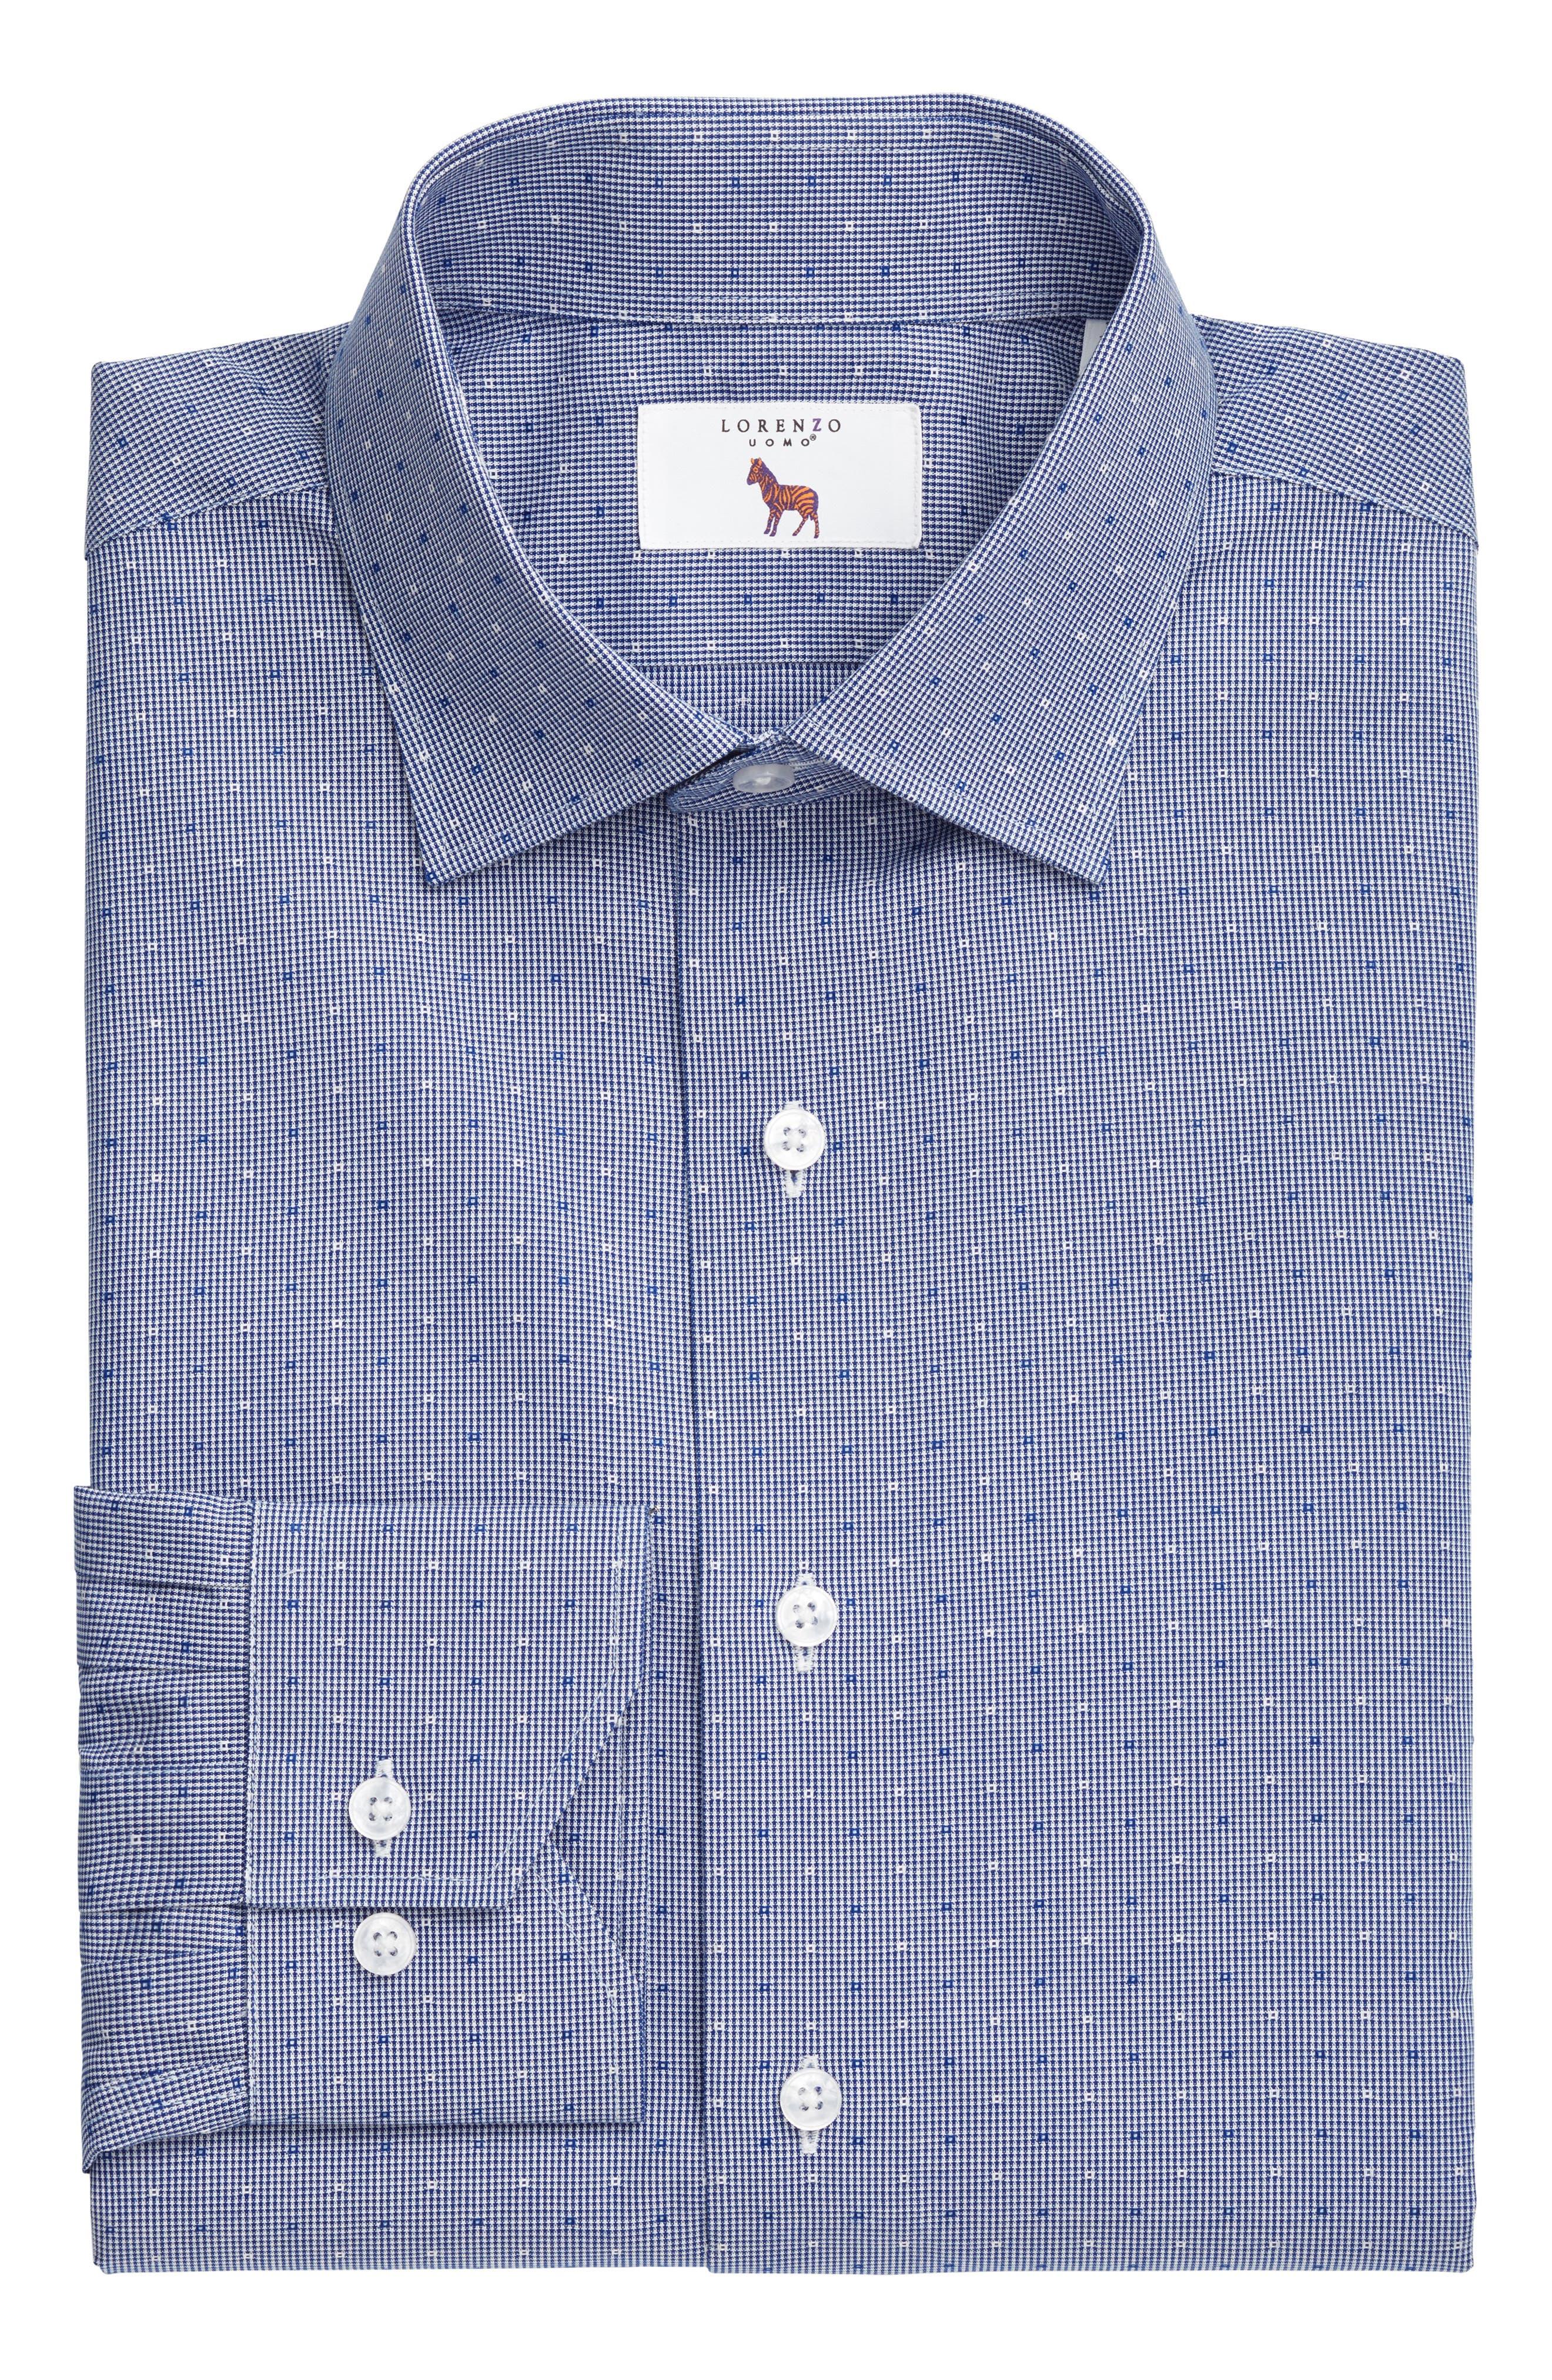 LORENZO UOMO, Trim Fit Check Dress Shirt, Alternate thumbnail 3, color, NAVY